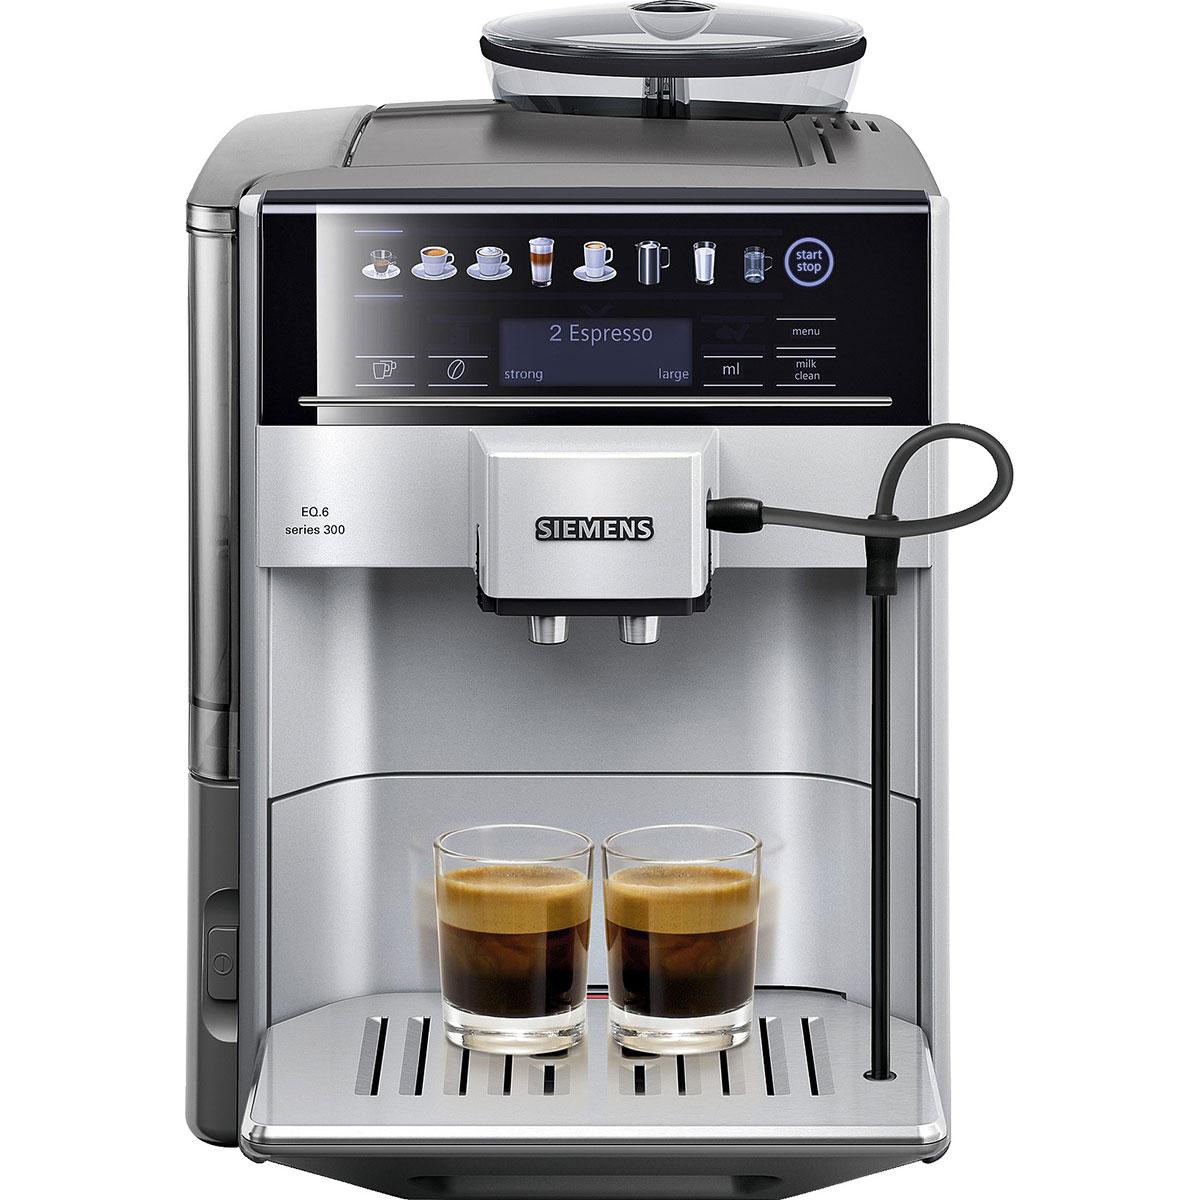 Image of   Siemens espressomaskine - TE603201RW - Stål/sort